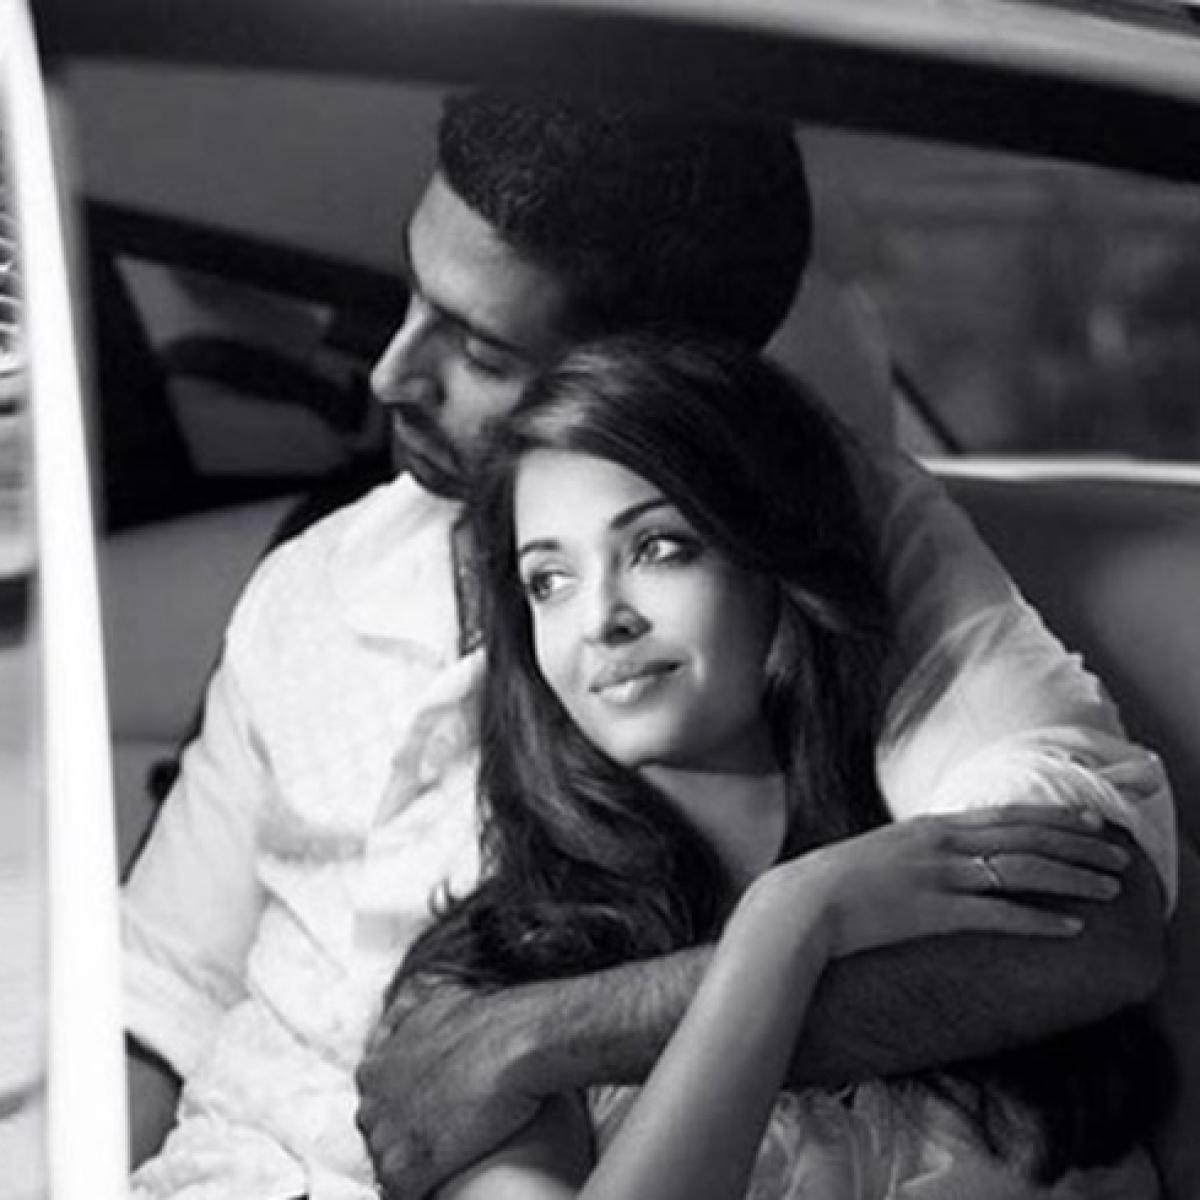 Throwback to Aishwarya Rai and Abhishek Bachchan's spontaneous dance video on 'Dhoom Dhoom'